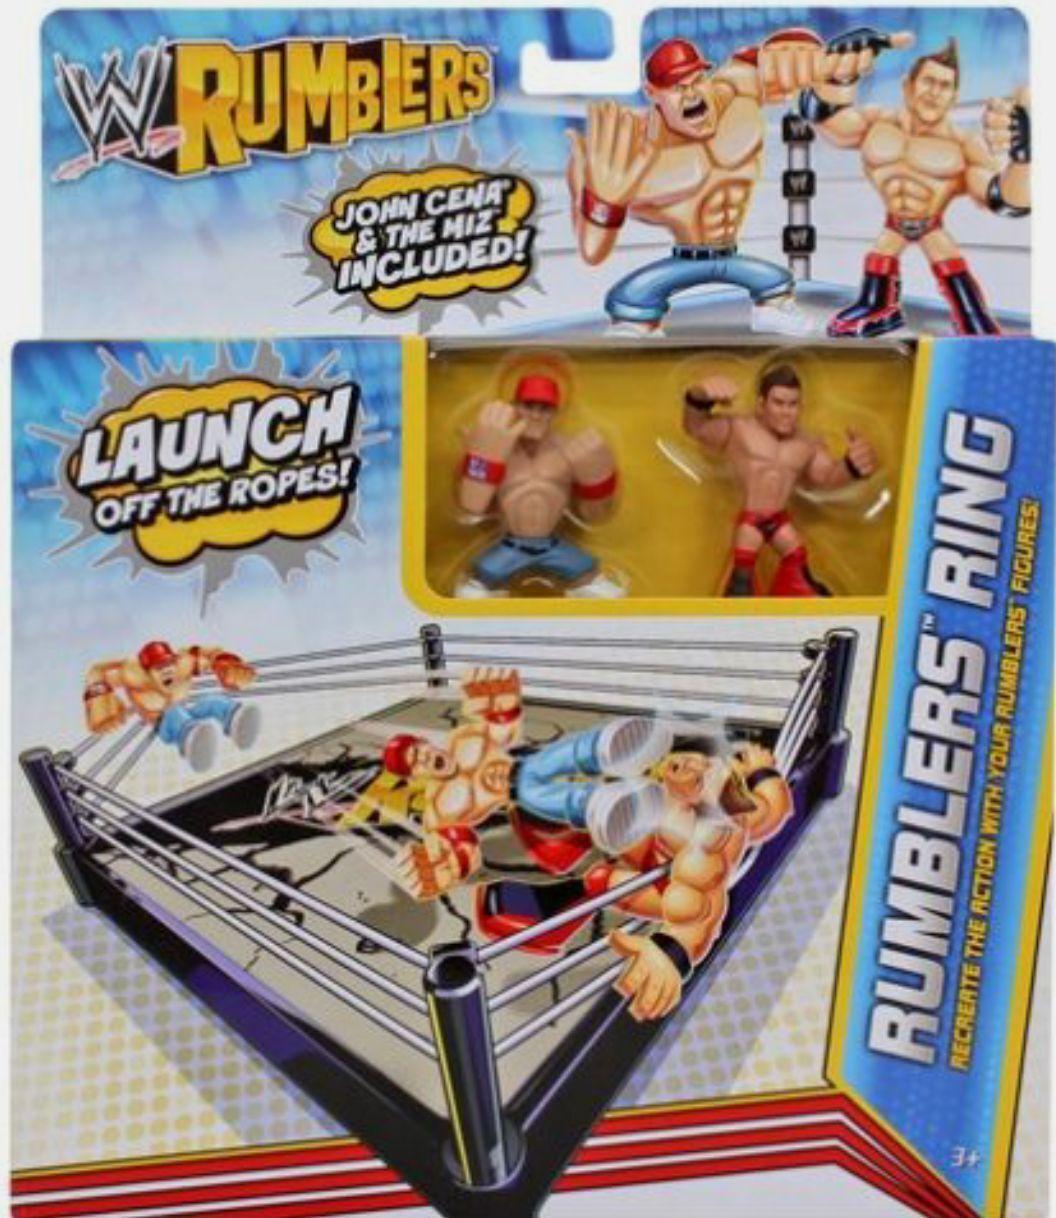 WWE Rumblers Ring Playset w John Cena & The Miz Figures New Factory Sealed 2011